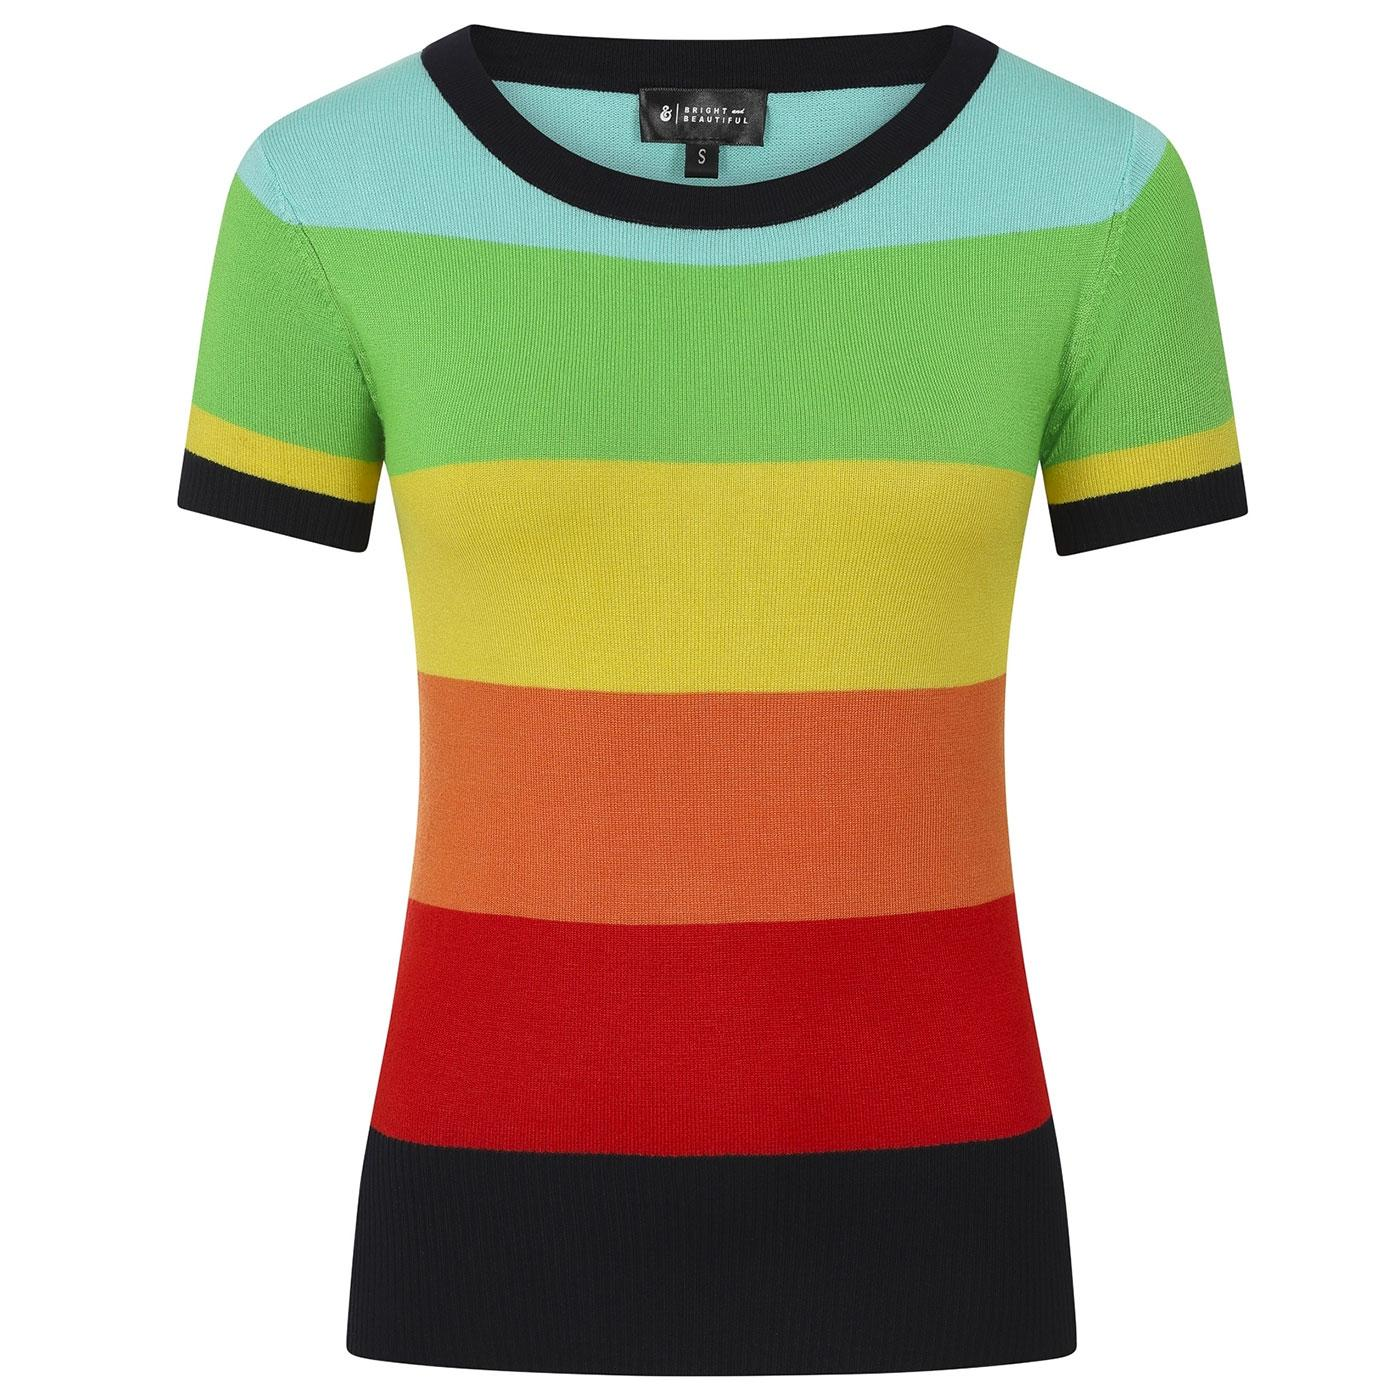 Sydney BRIGHT & BEAUTIFUL 70s Rainbow Dreamer Top